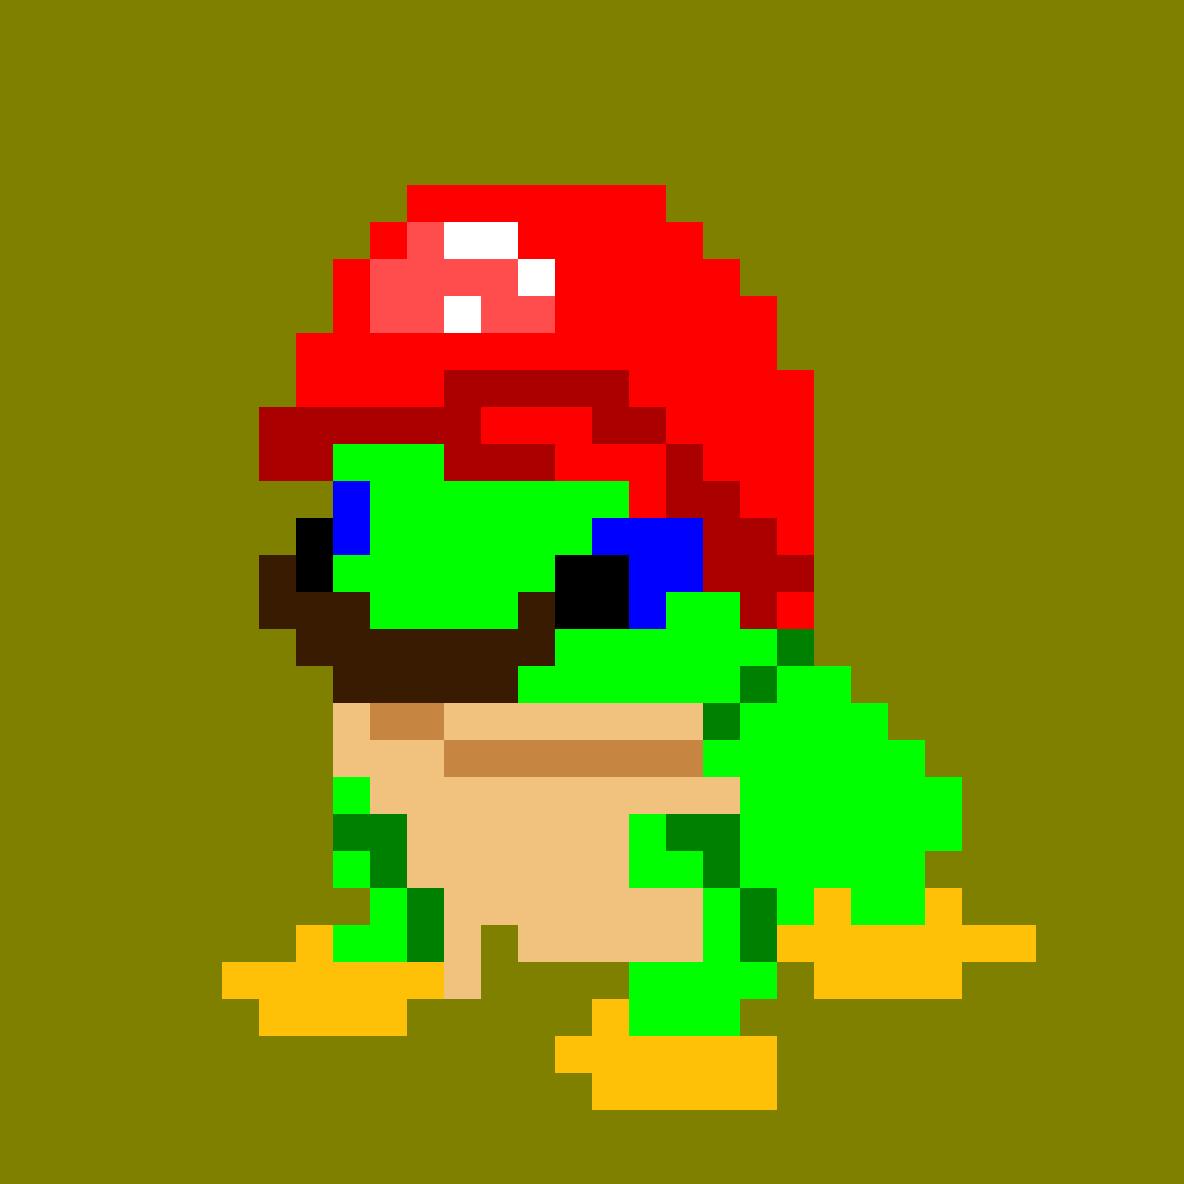 Pixilart Super Mario Odyssey Frog By Irondogmlg